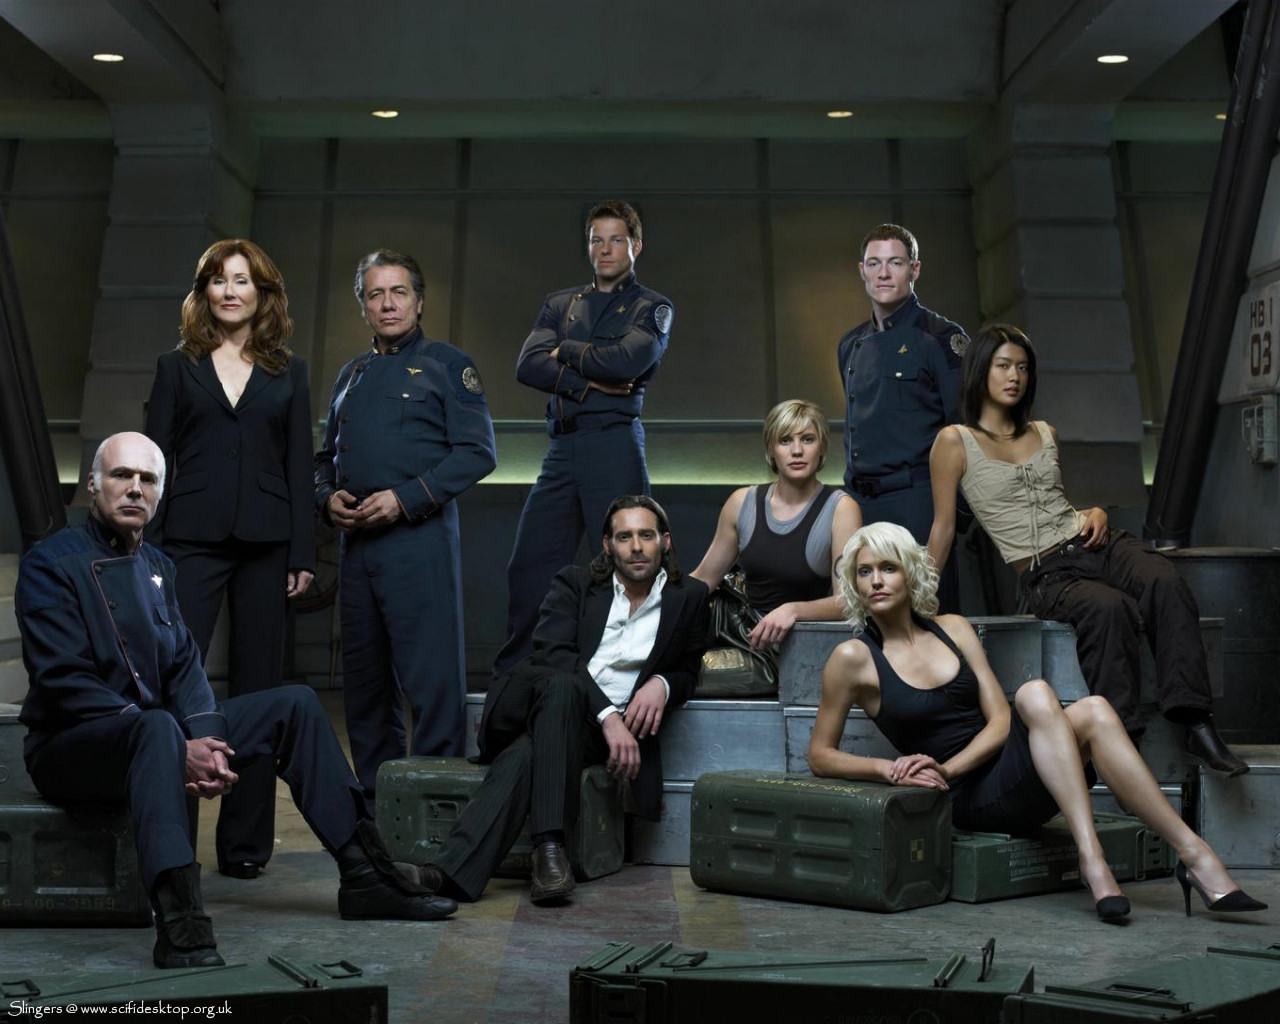 Battlestar Galactica (2003) wallpapers HD quality